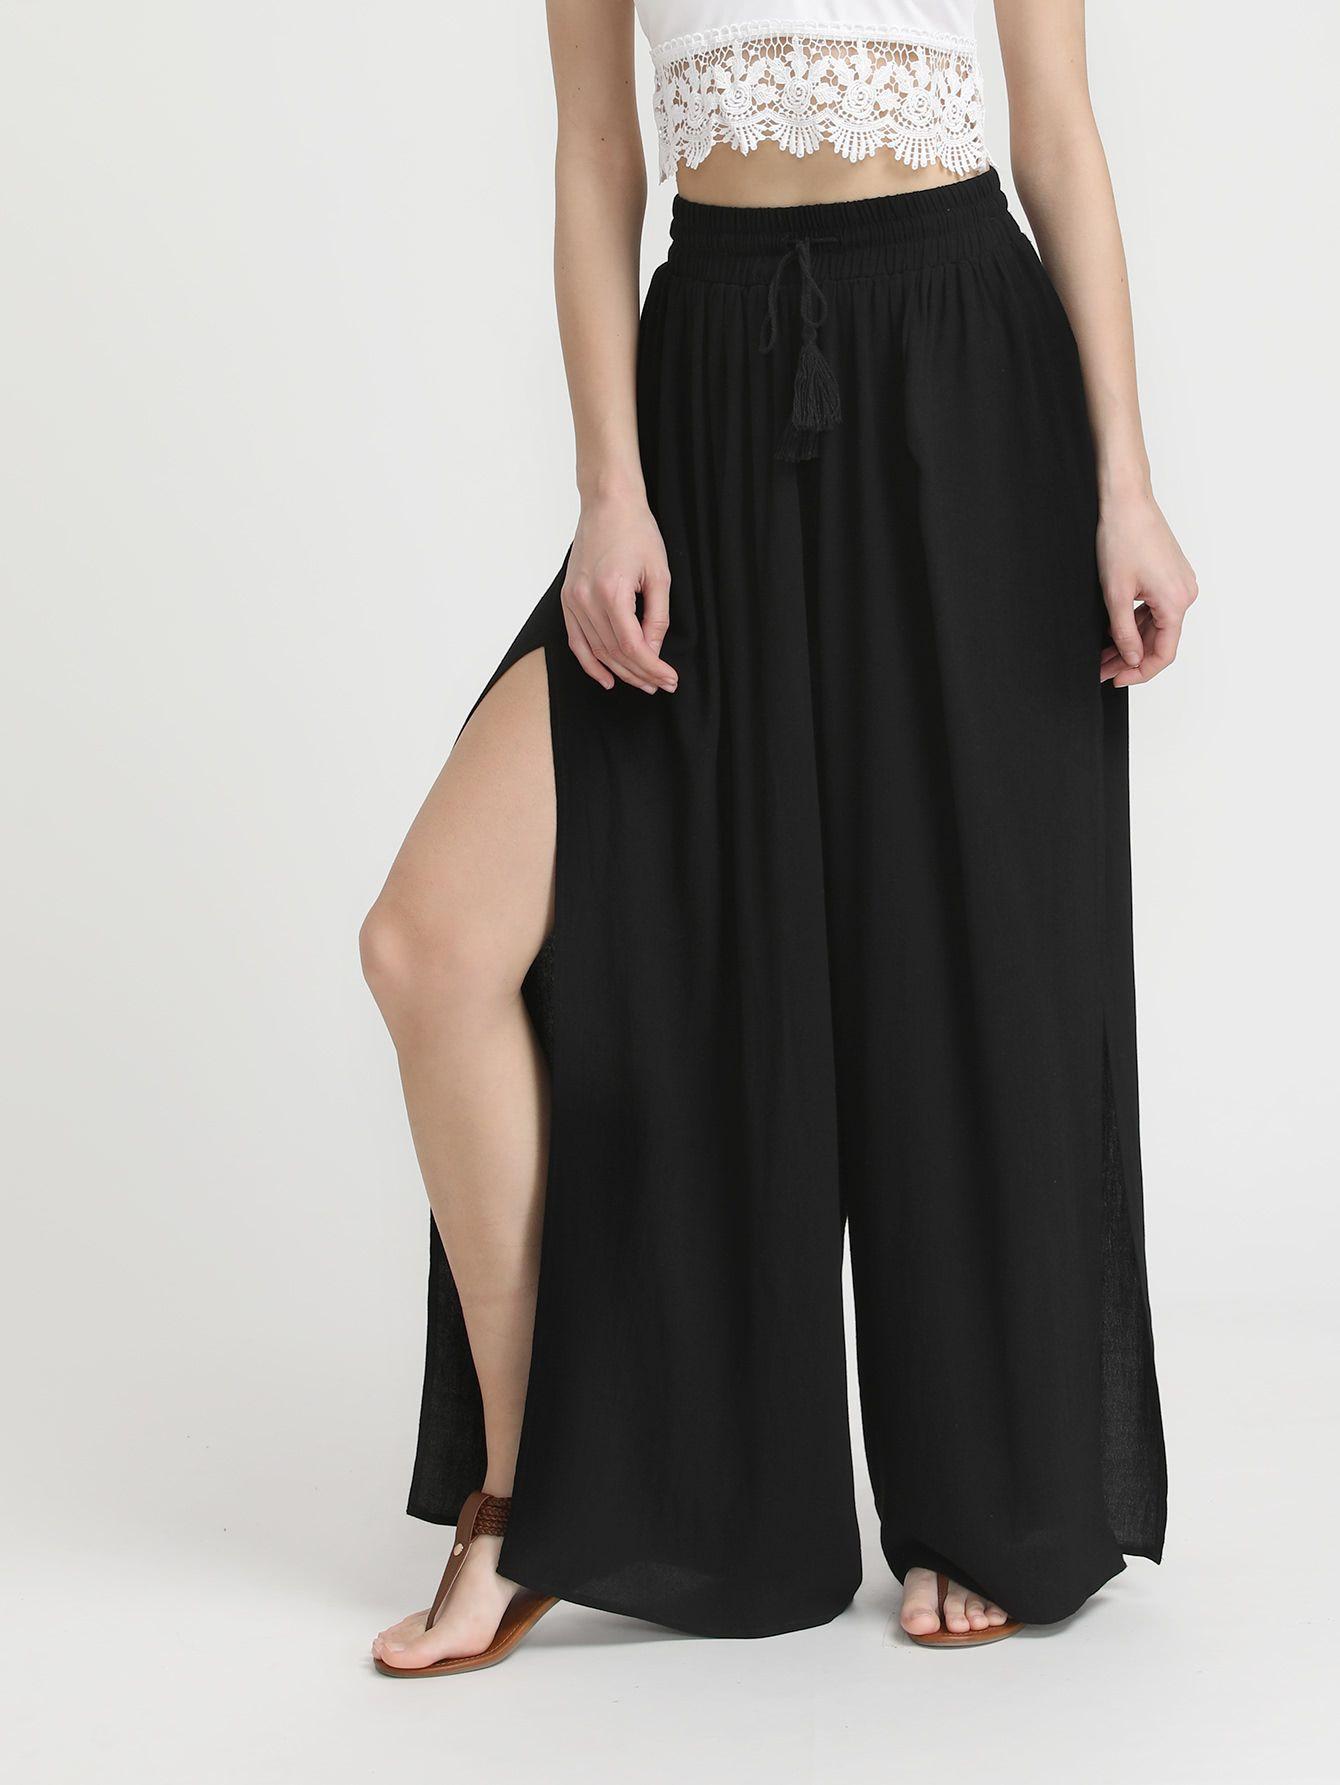 Pantalones palazzo con cordón con aberturas laterales -Spanish  SheIn(Sheinside) a530732391e2